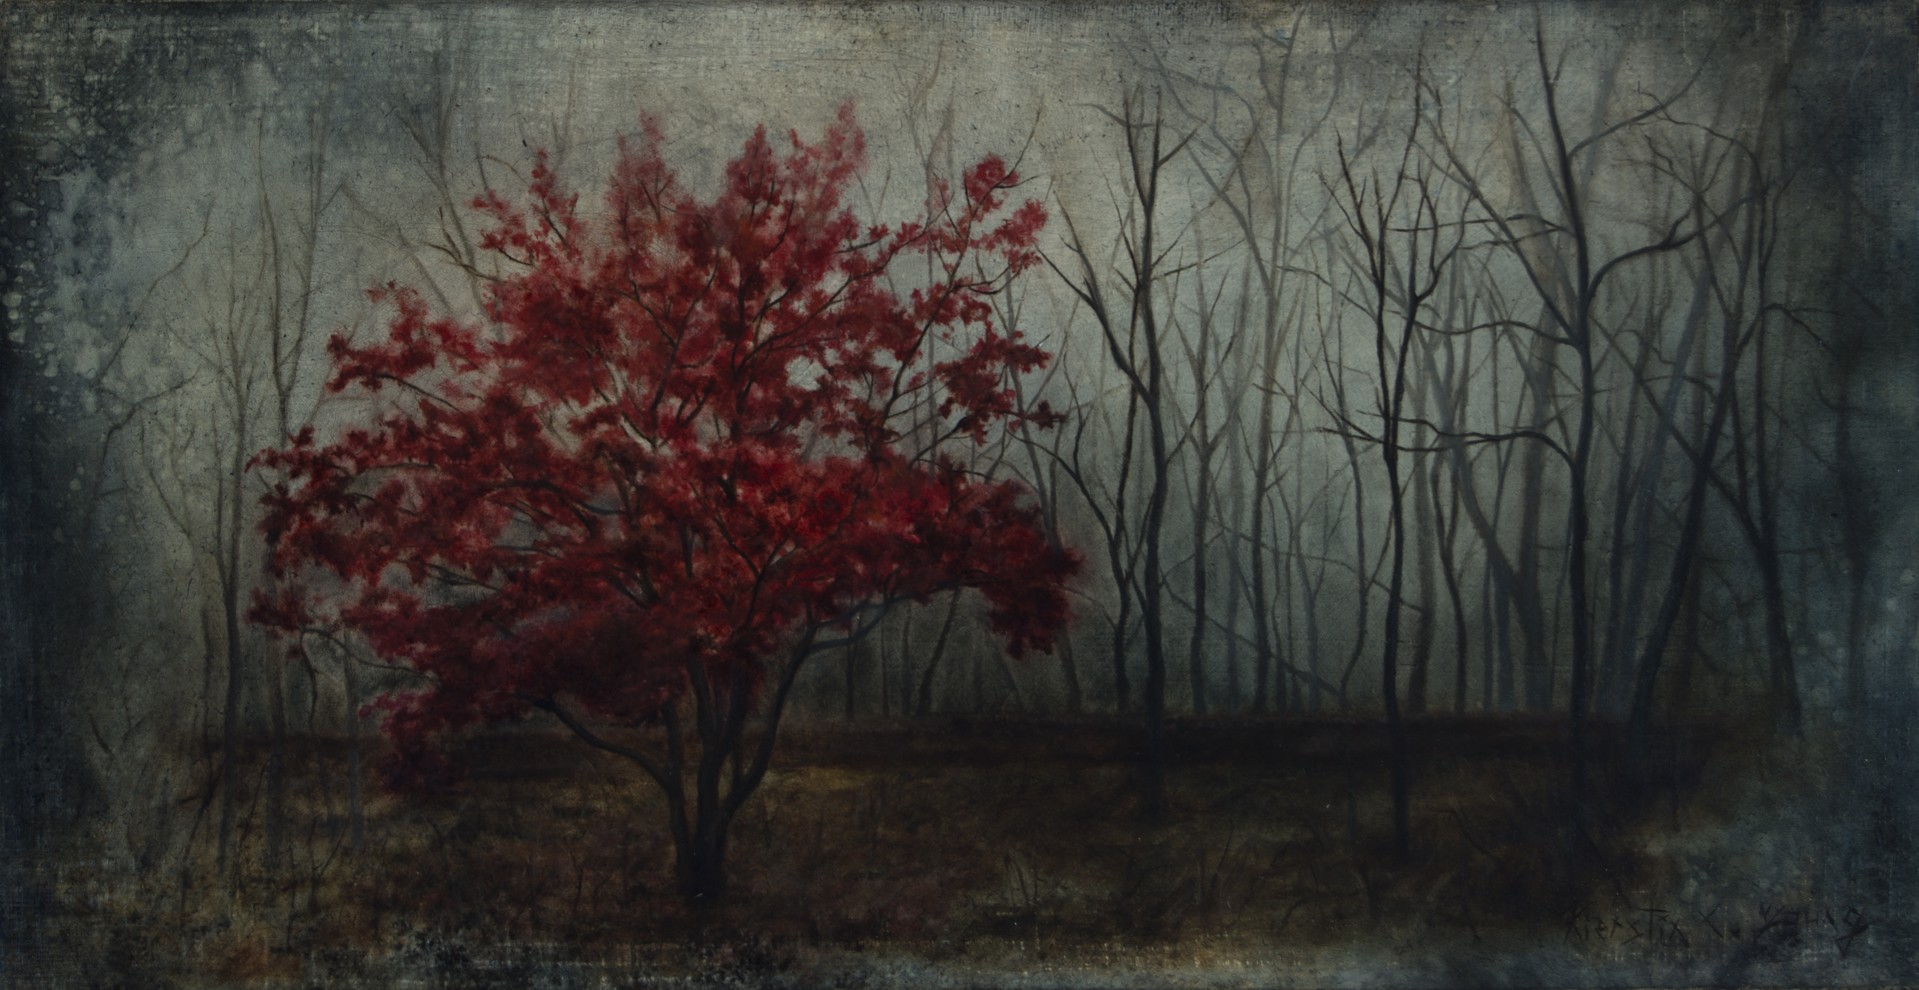 Antemortem Rubrum by Kierstin Young